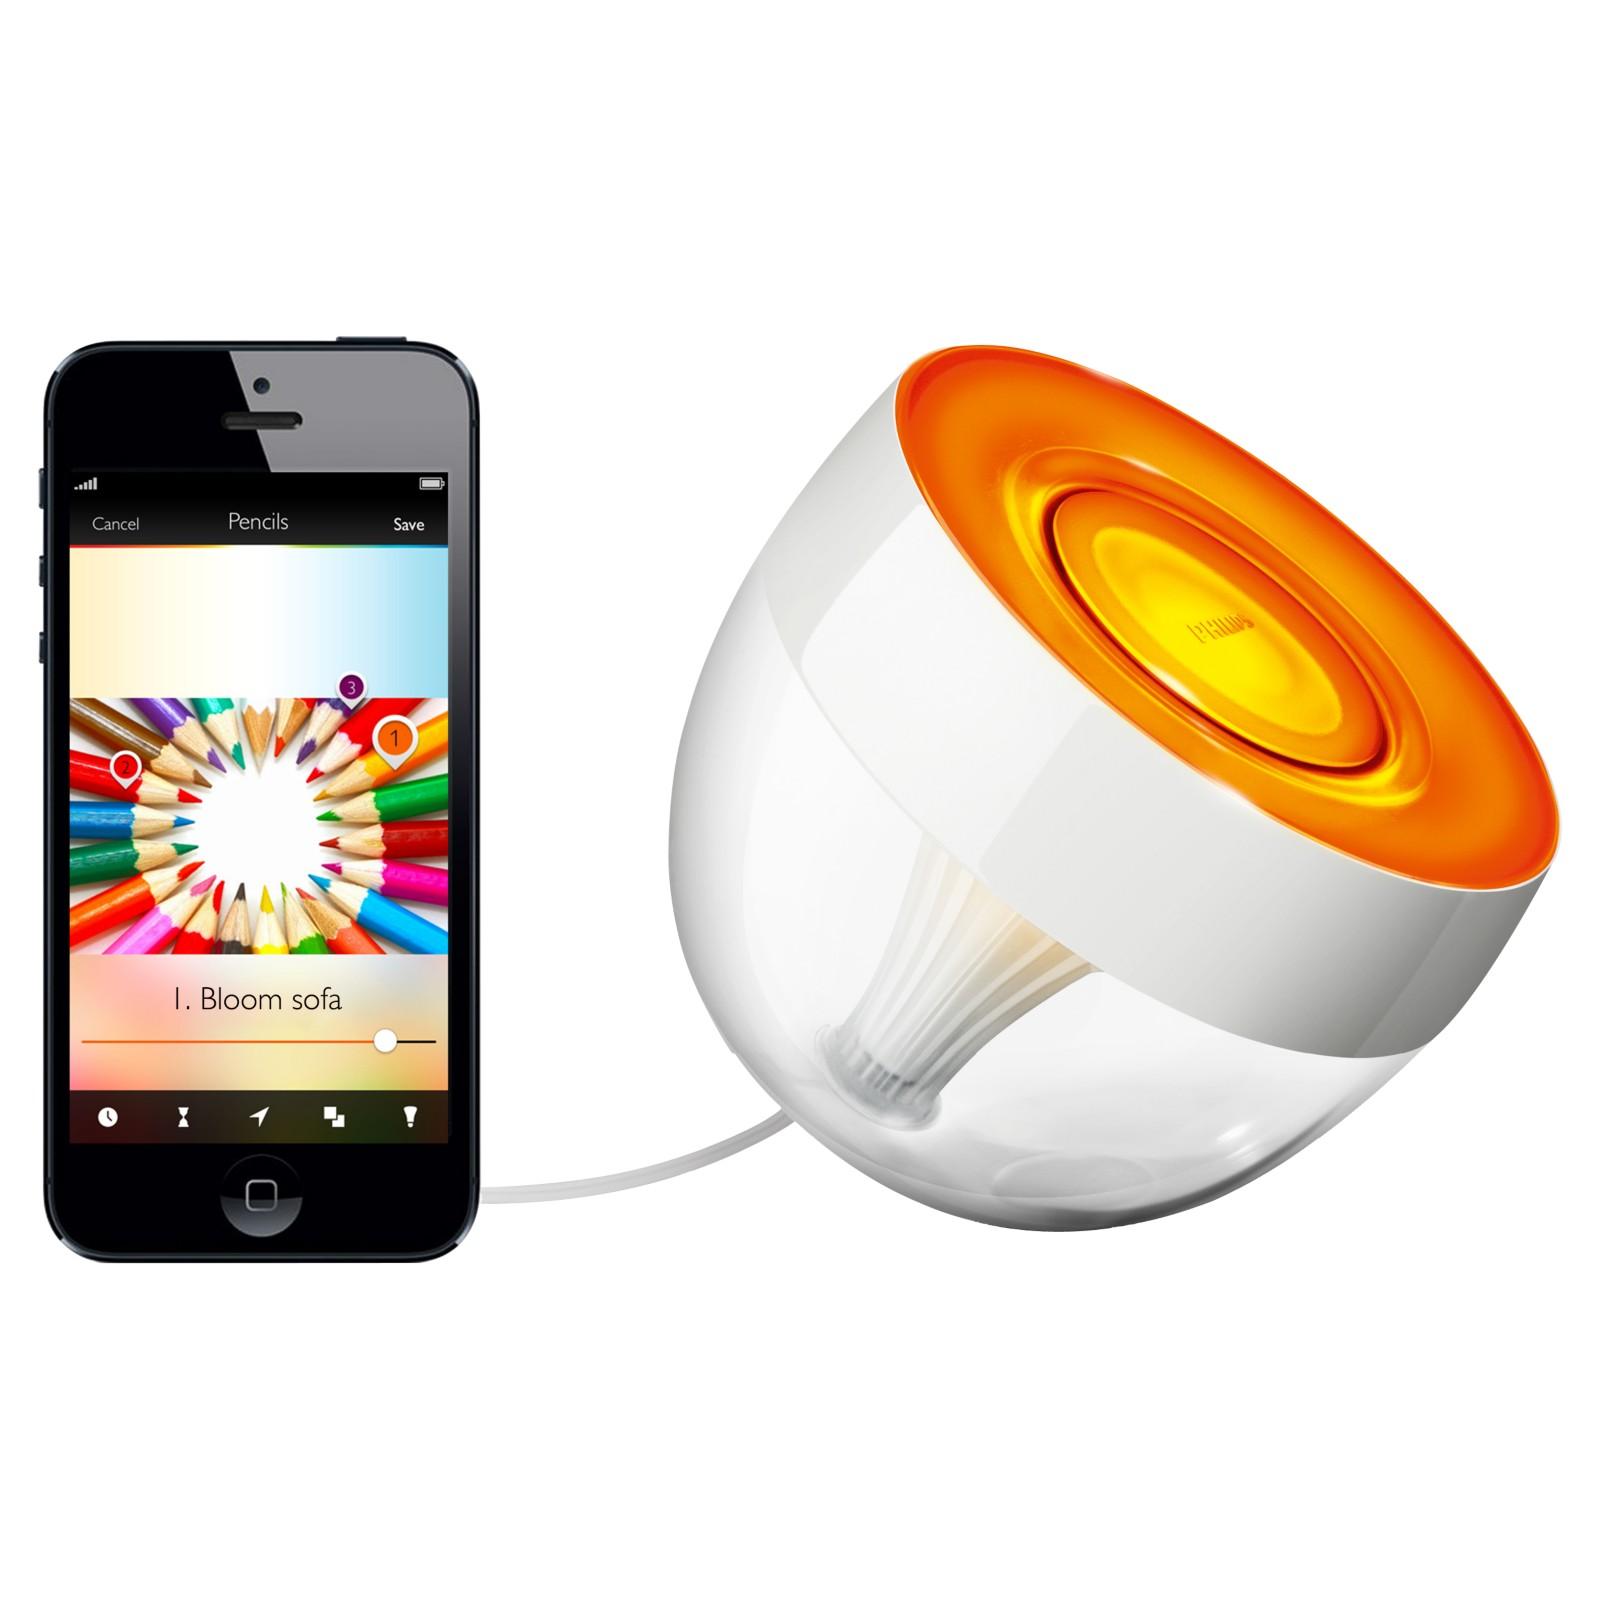 Philips Friends of Hue LivingColors Iris Colour Changing LED Mood Light